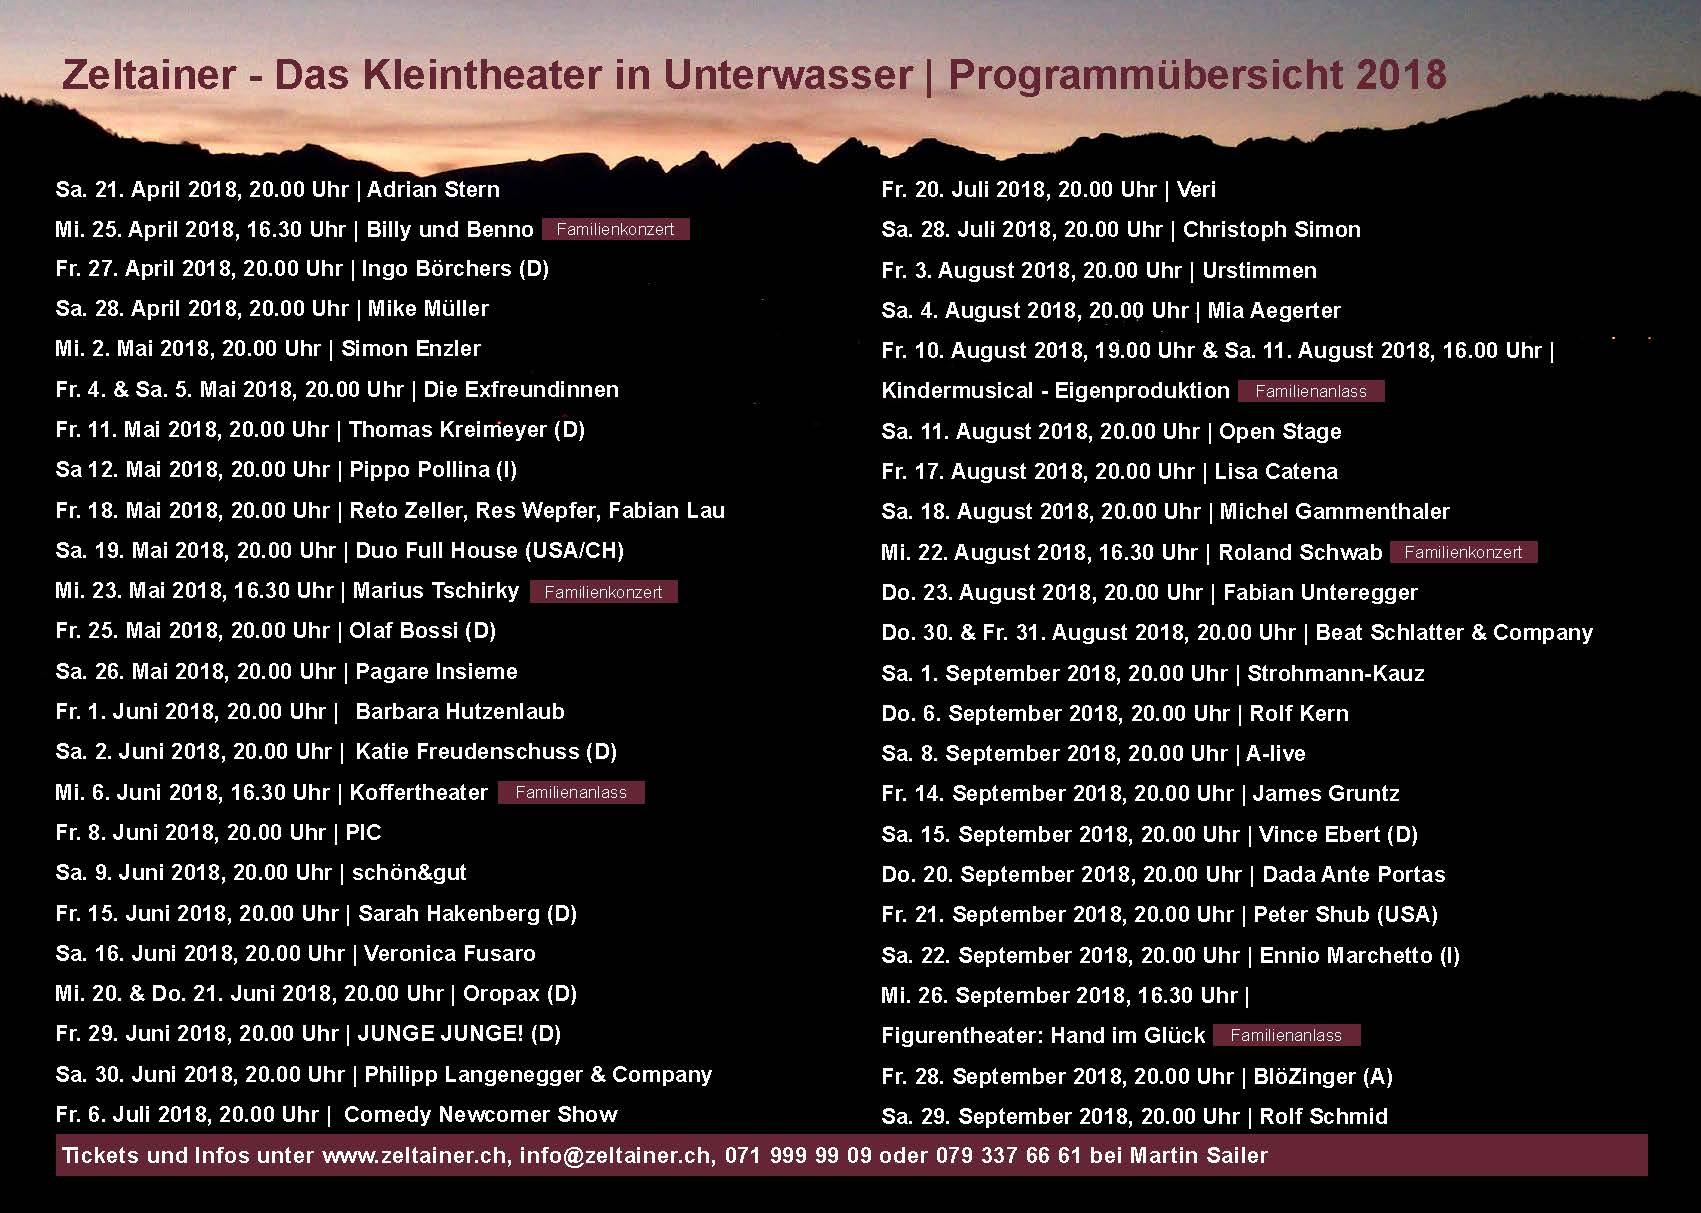 Zeltainer-Booklet_Programm_2018